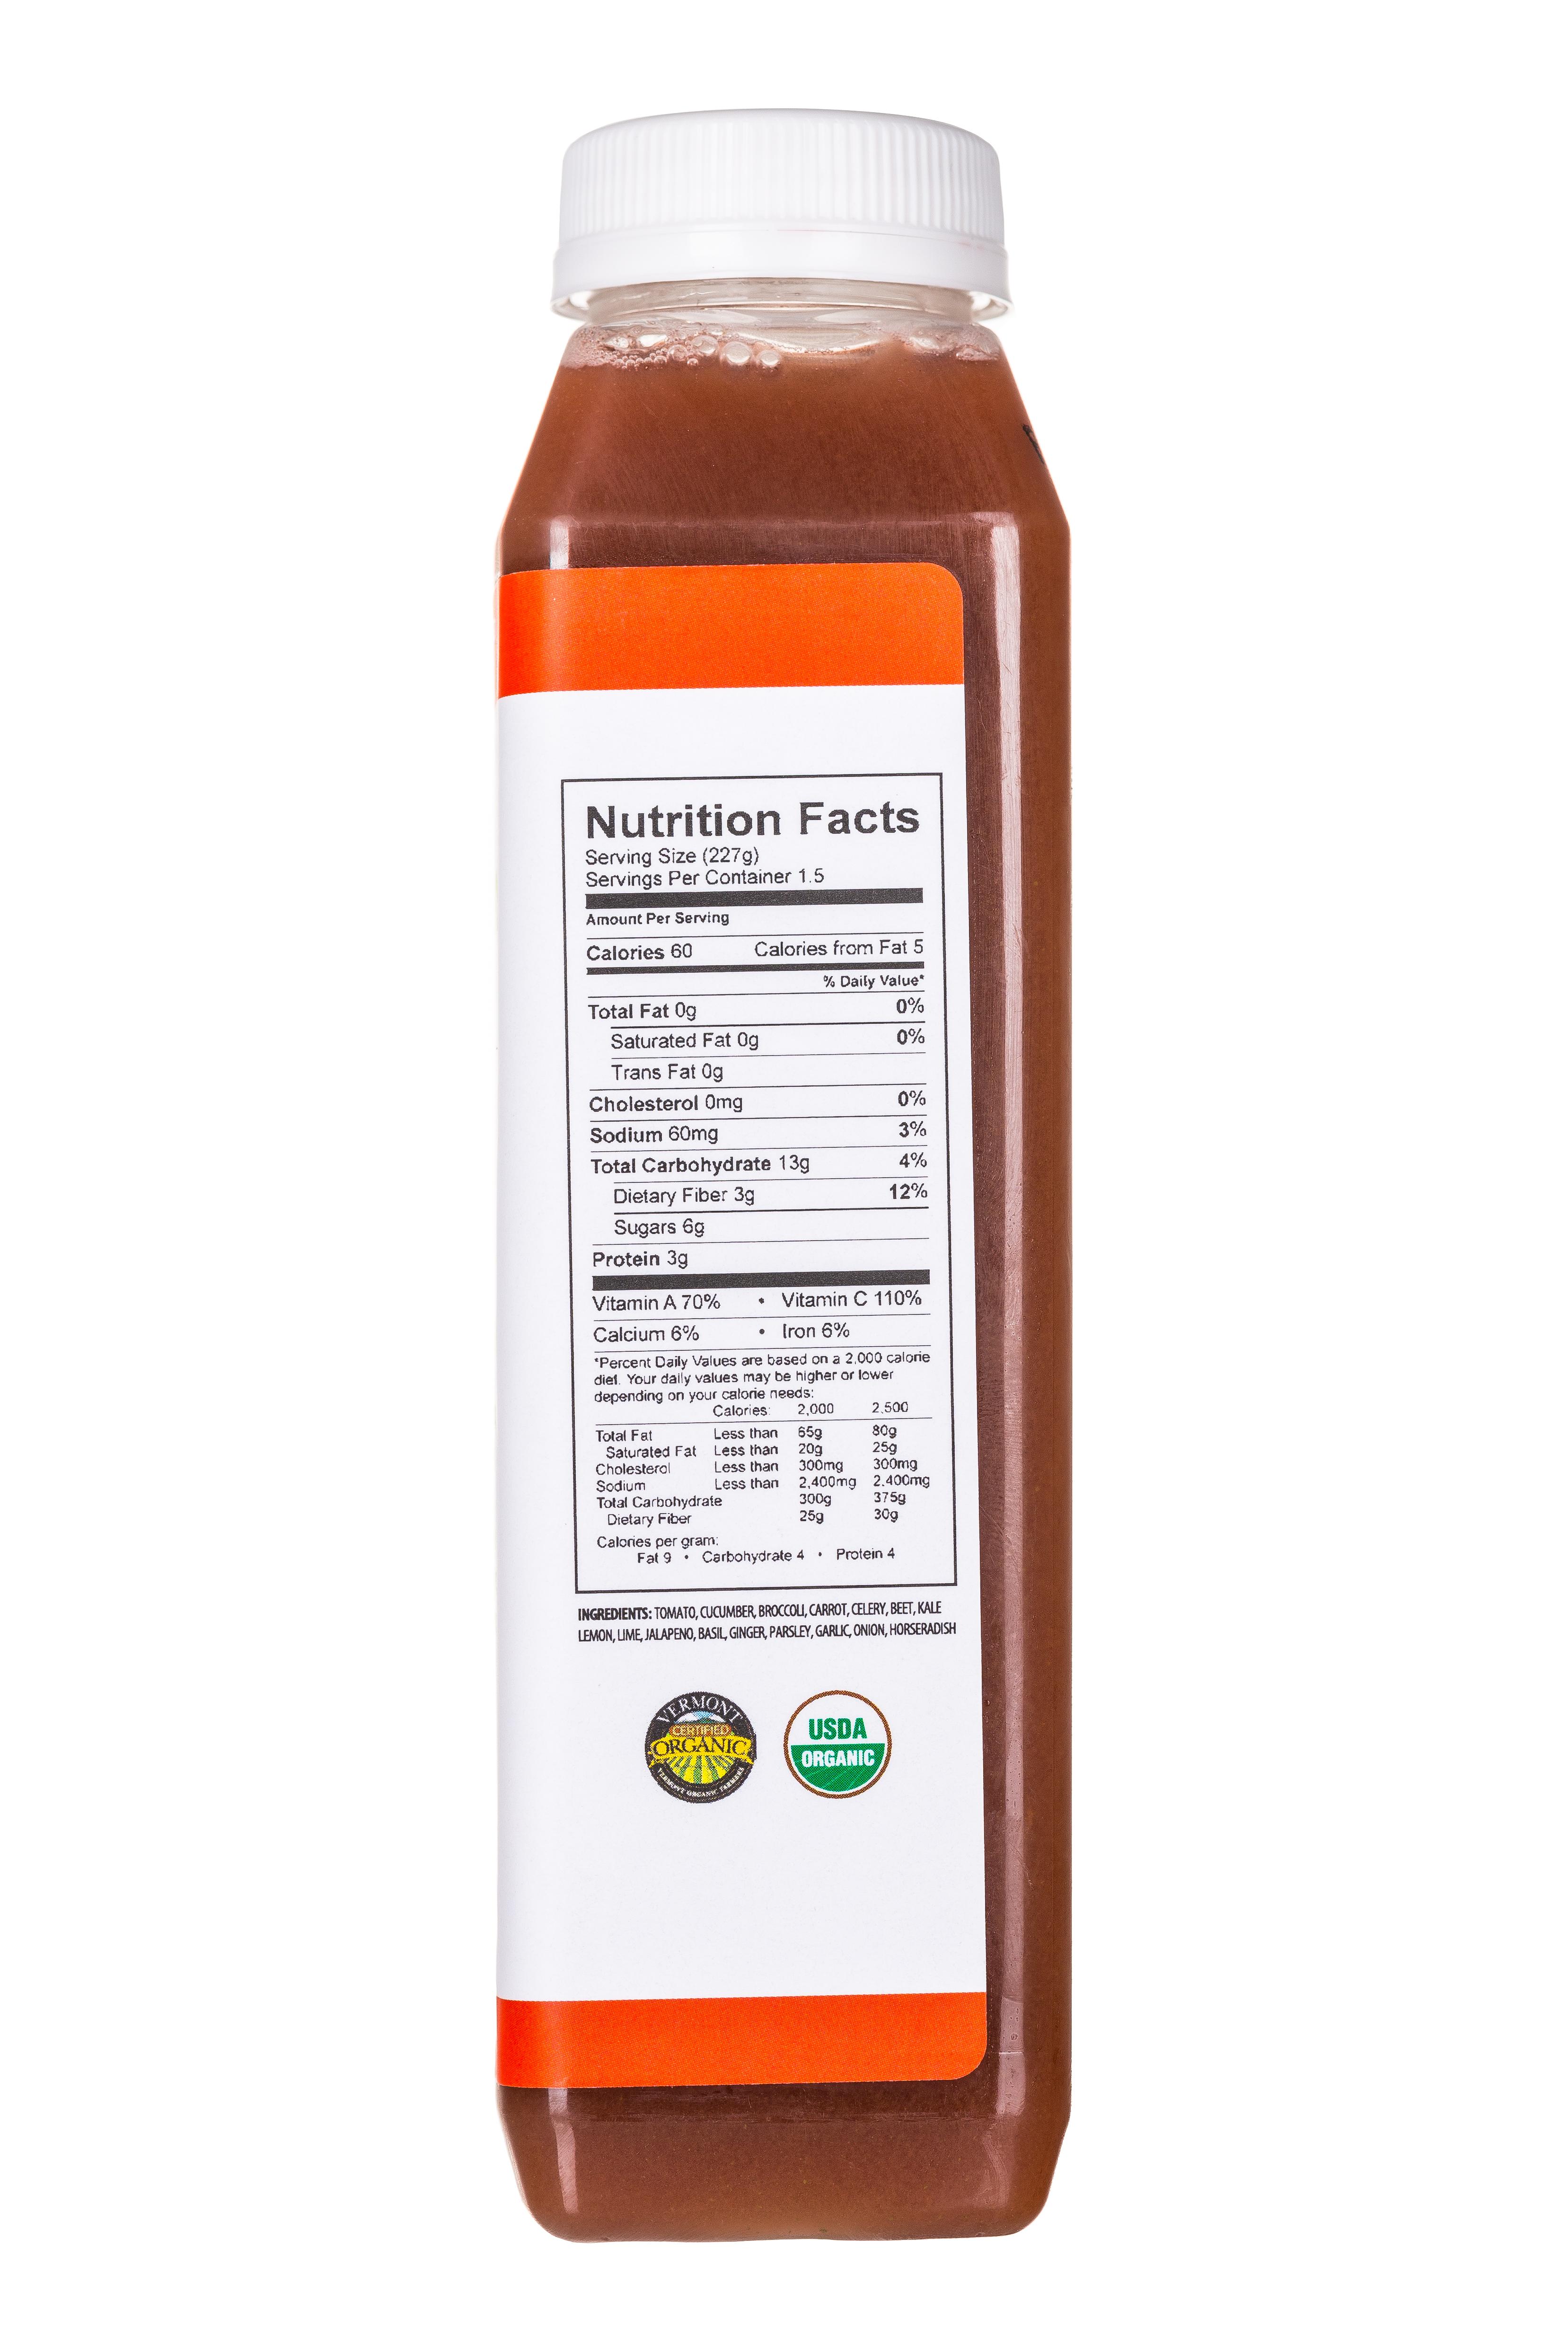 Pulp Kitchen Juice: PulpKitchen-Juice-Celebrate-Facts